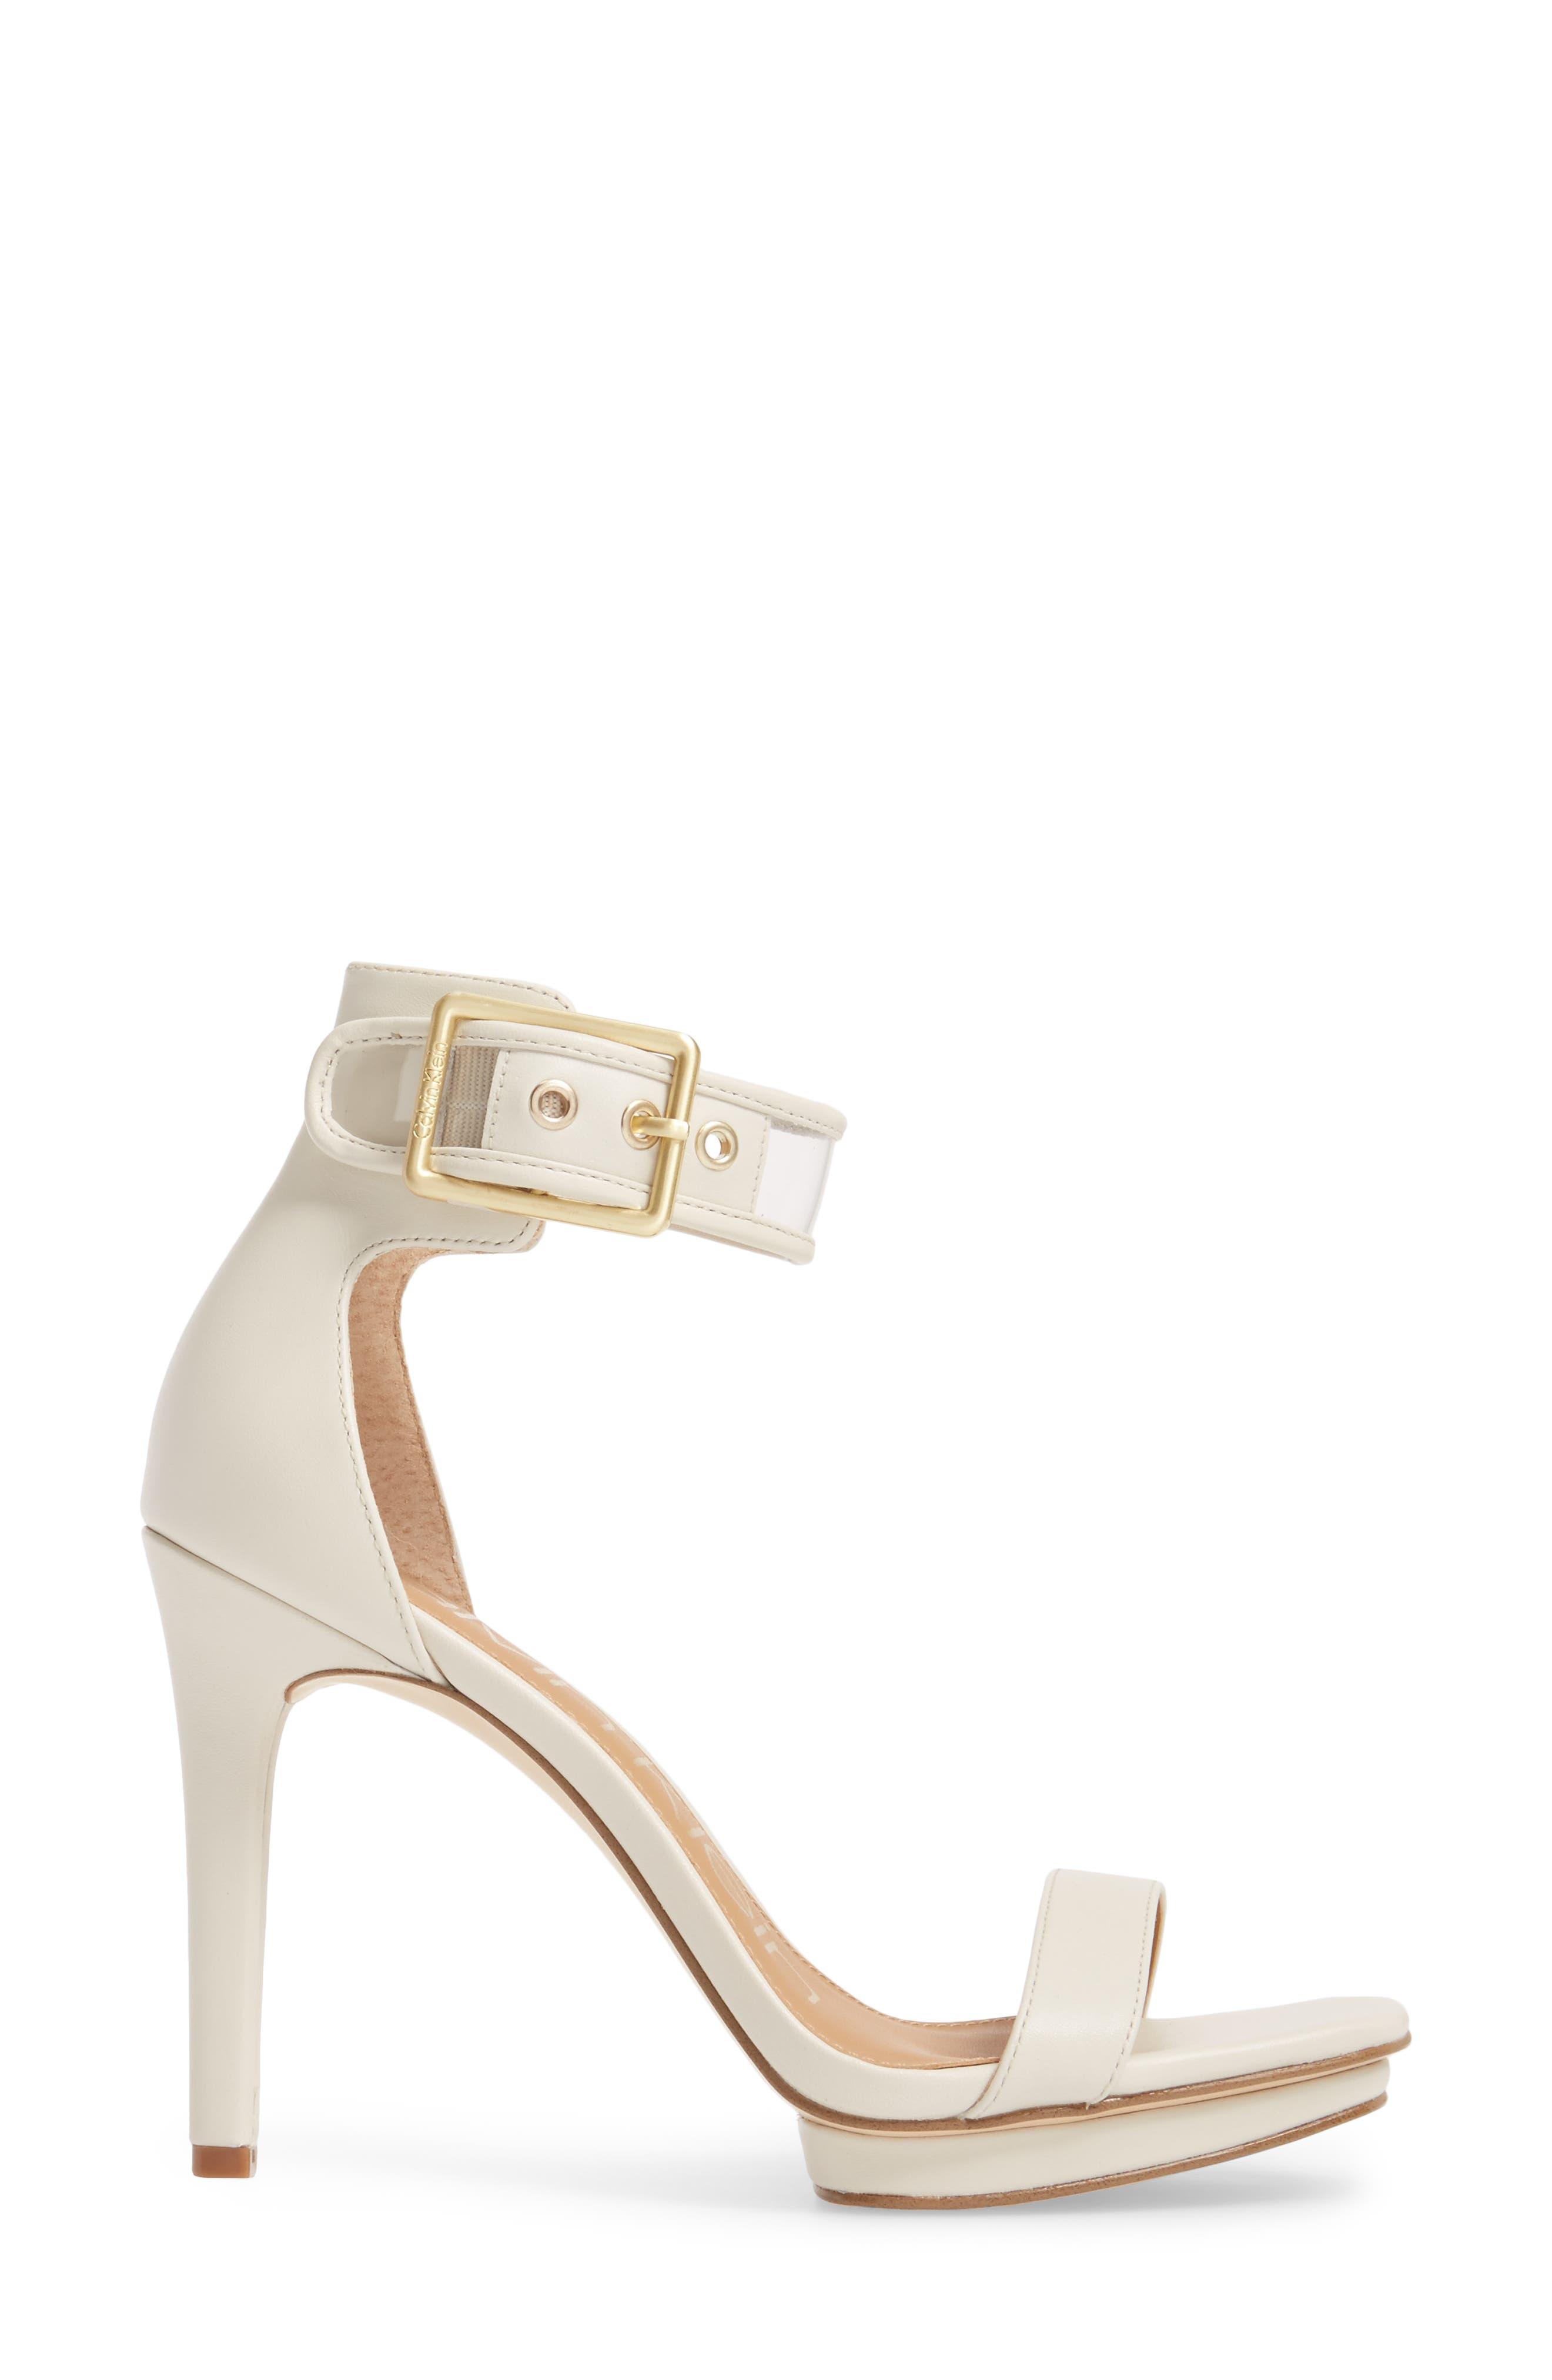 Vable Sandal,                             Alternate thumbnail 3, color,                             Soft White Leather